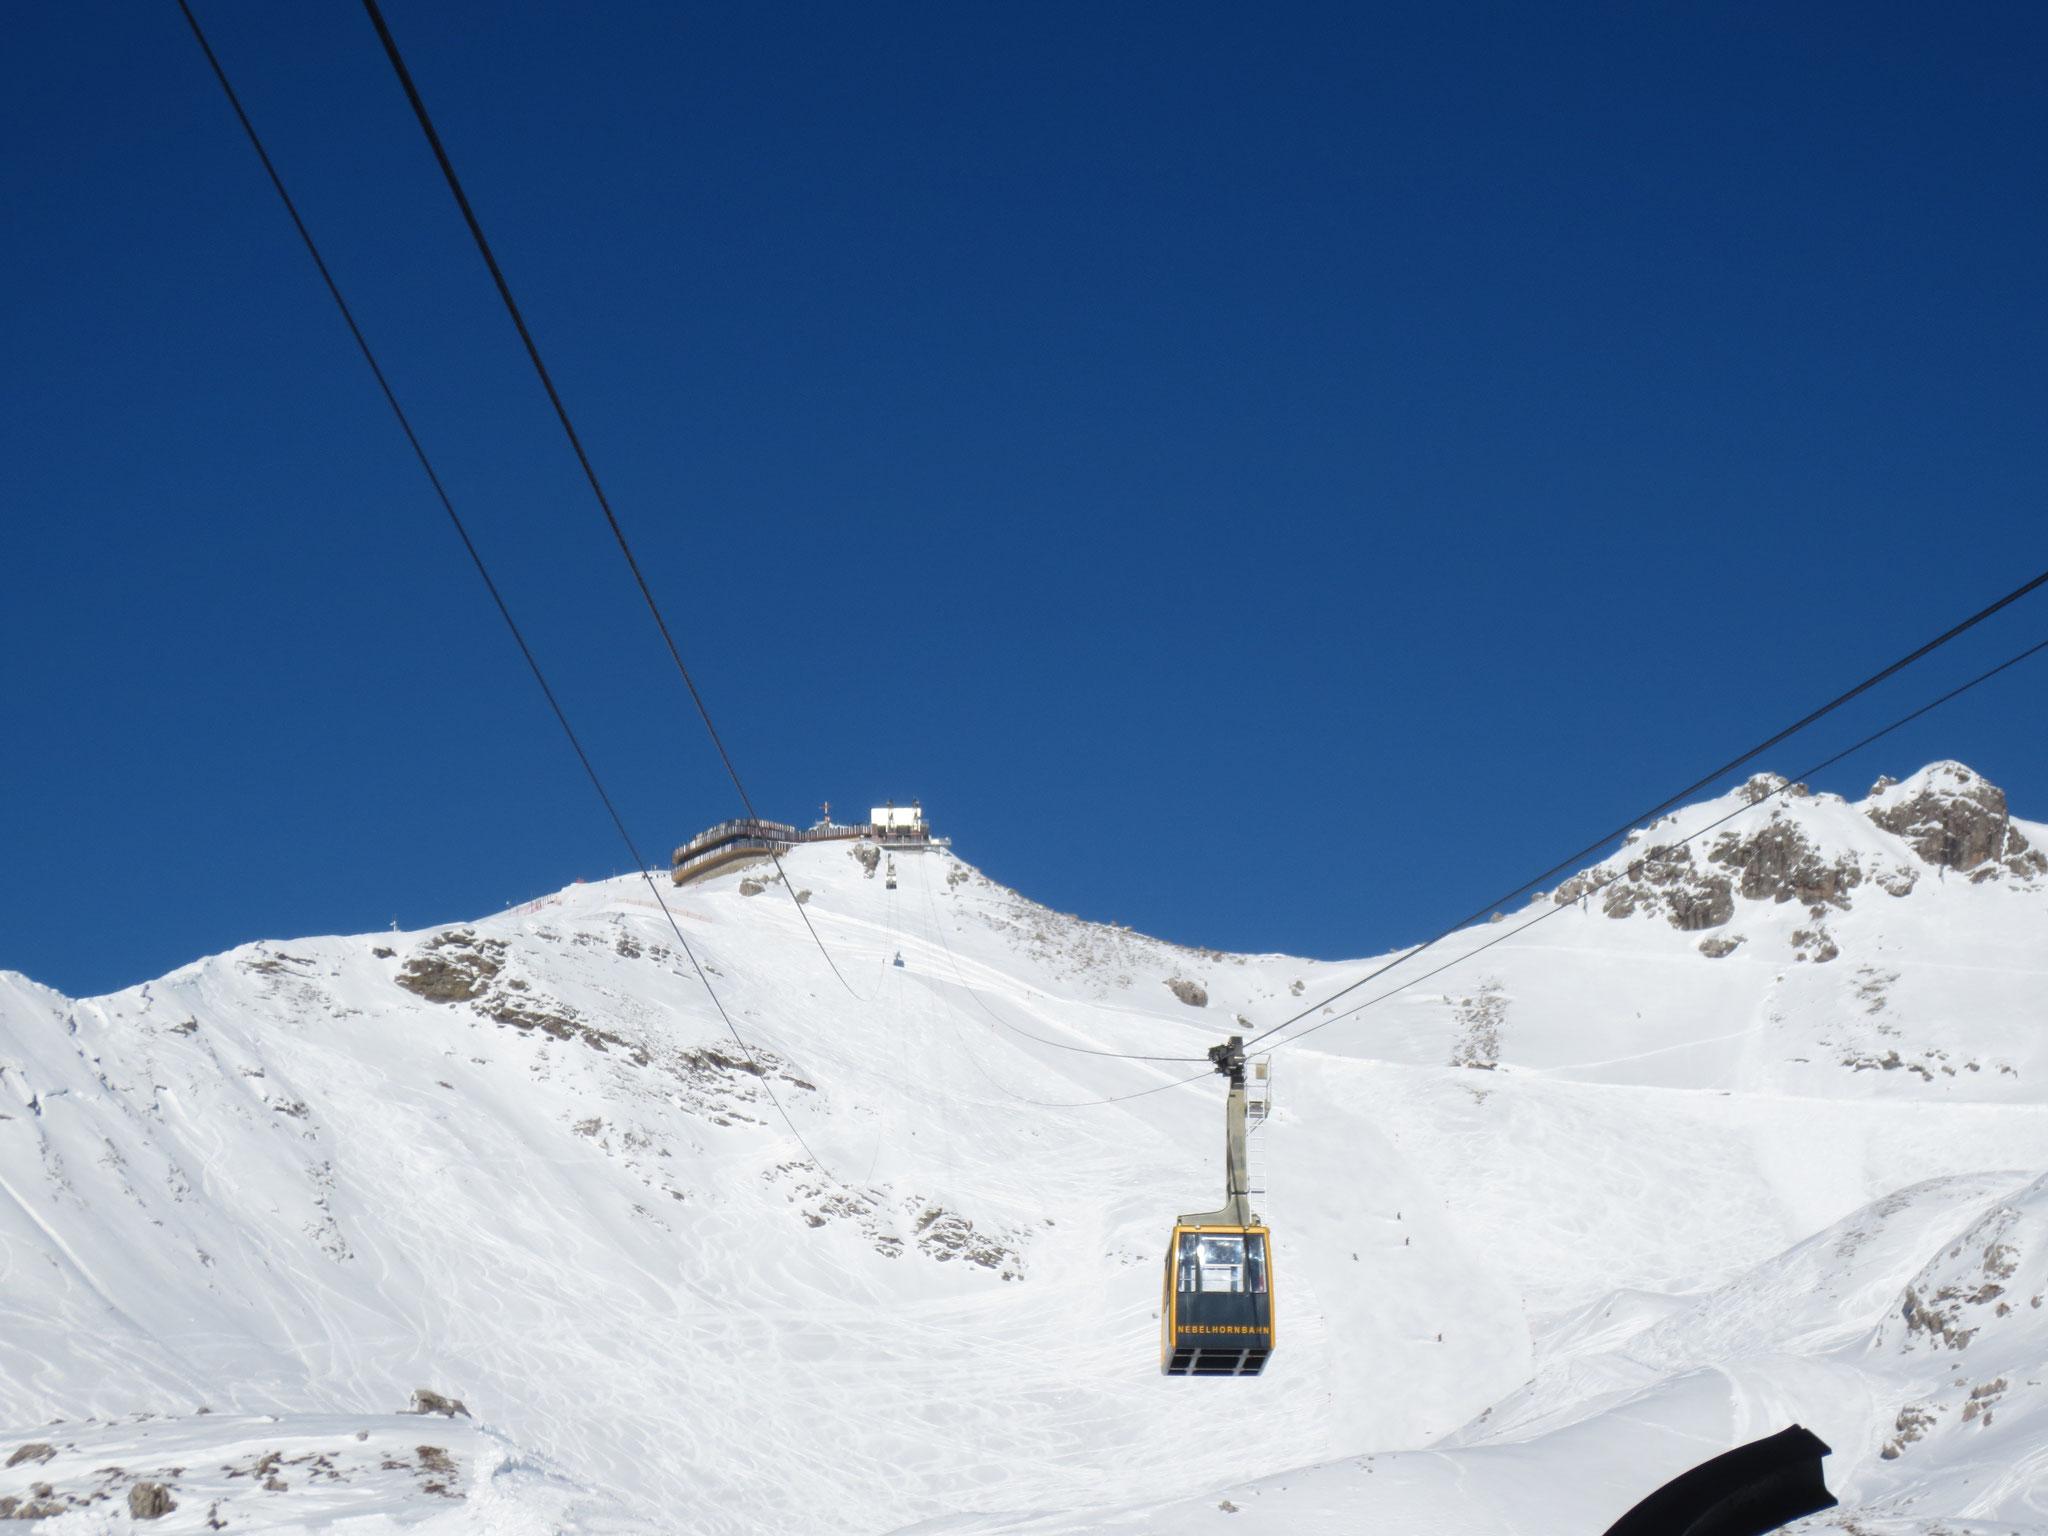 Gipfel Nebelhorn mit neuer Station